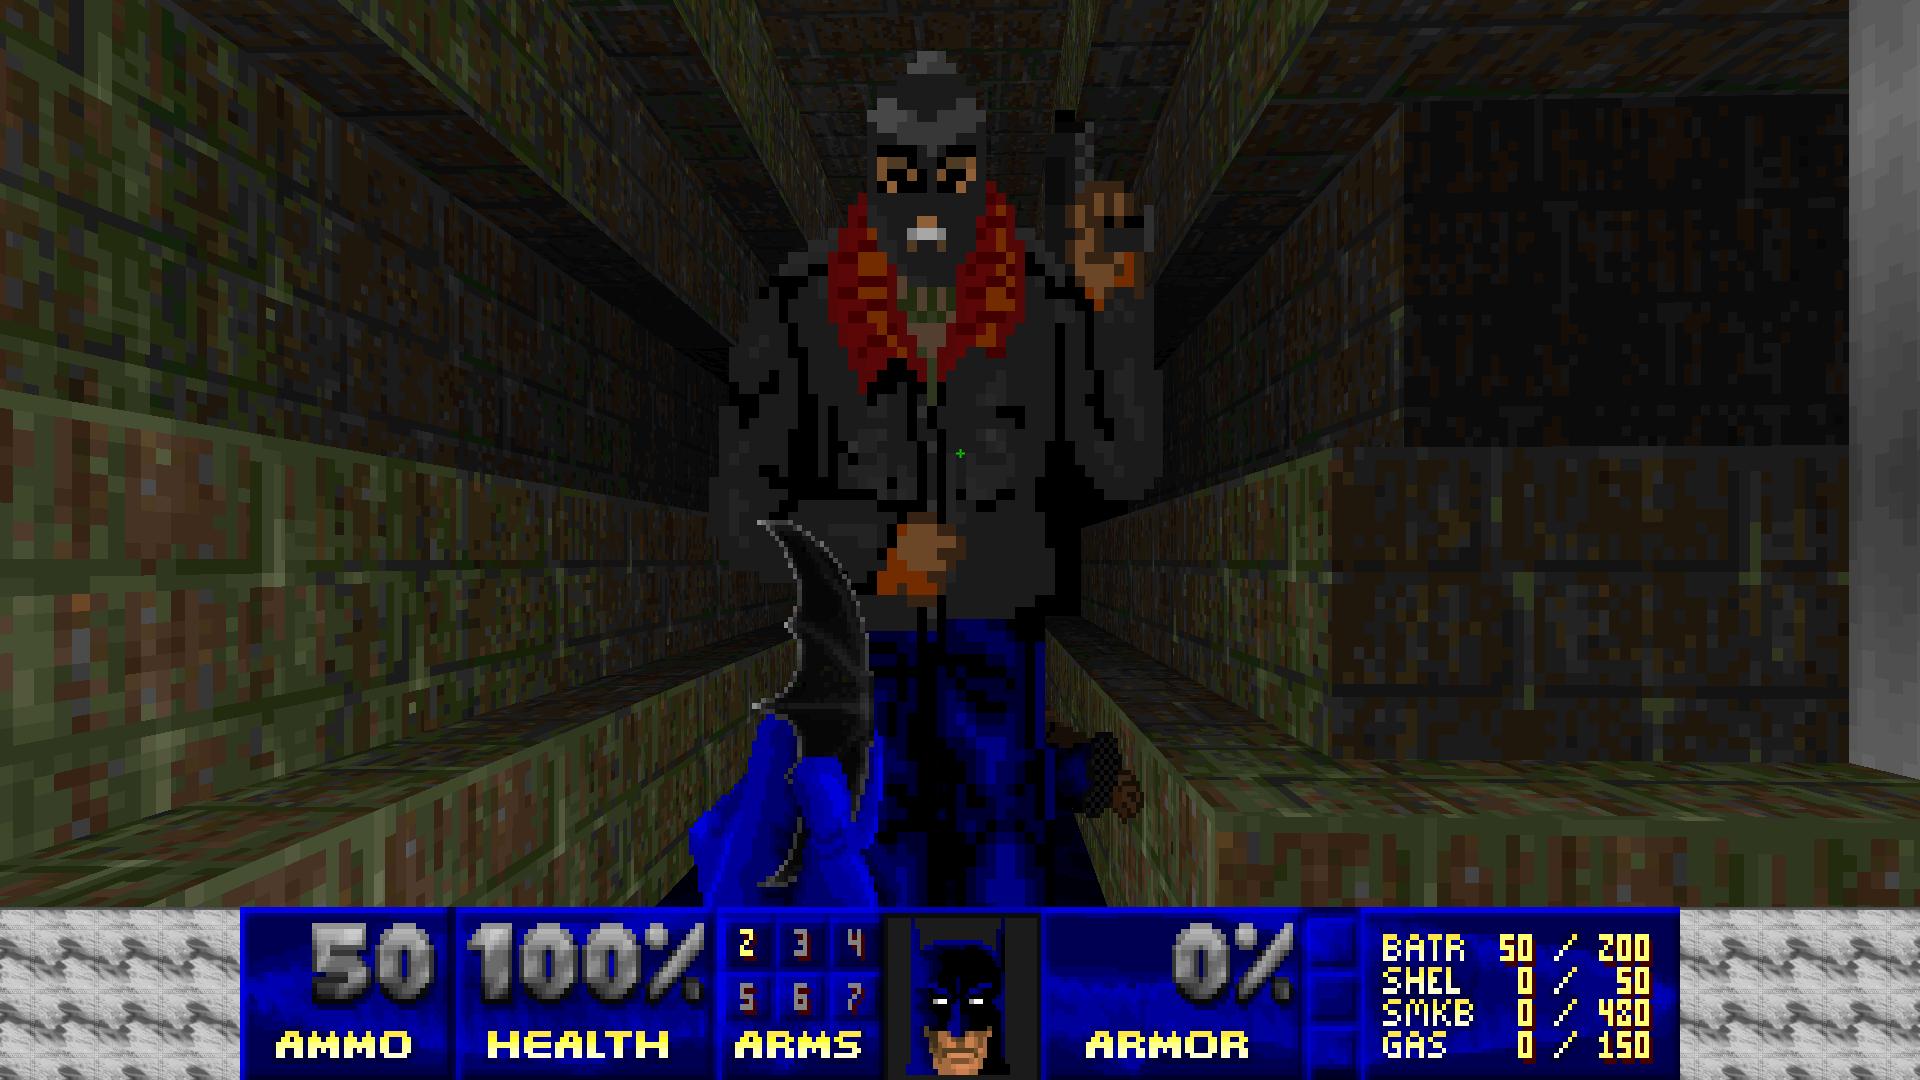 original batman doom, where batman smaller than thugs